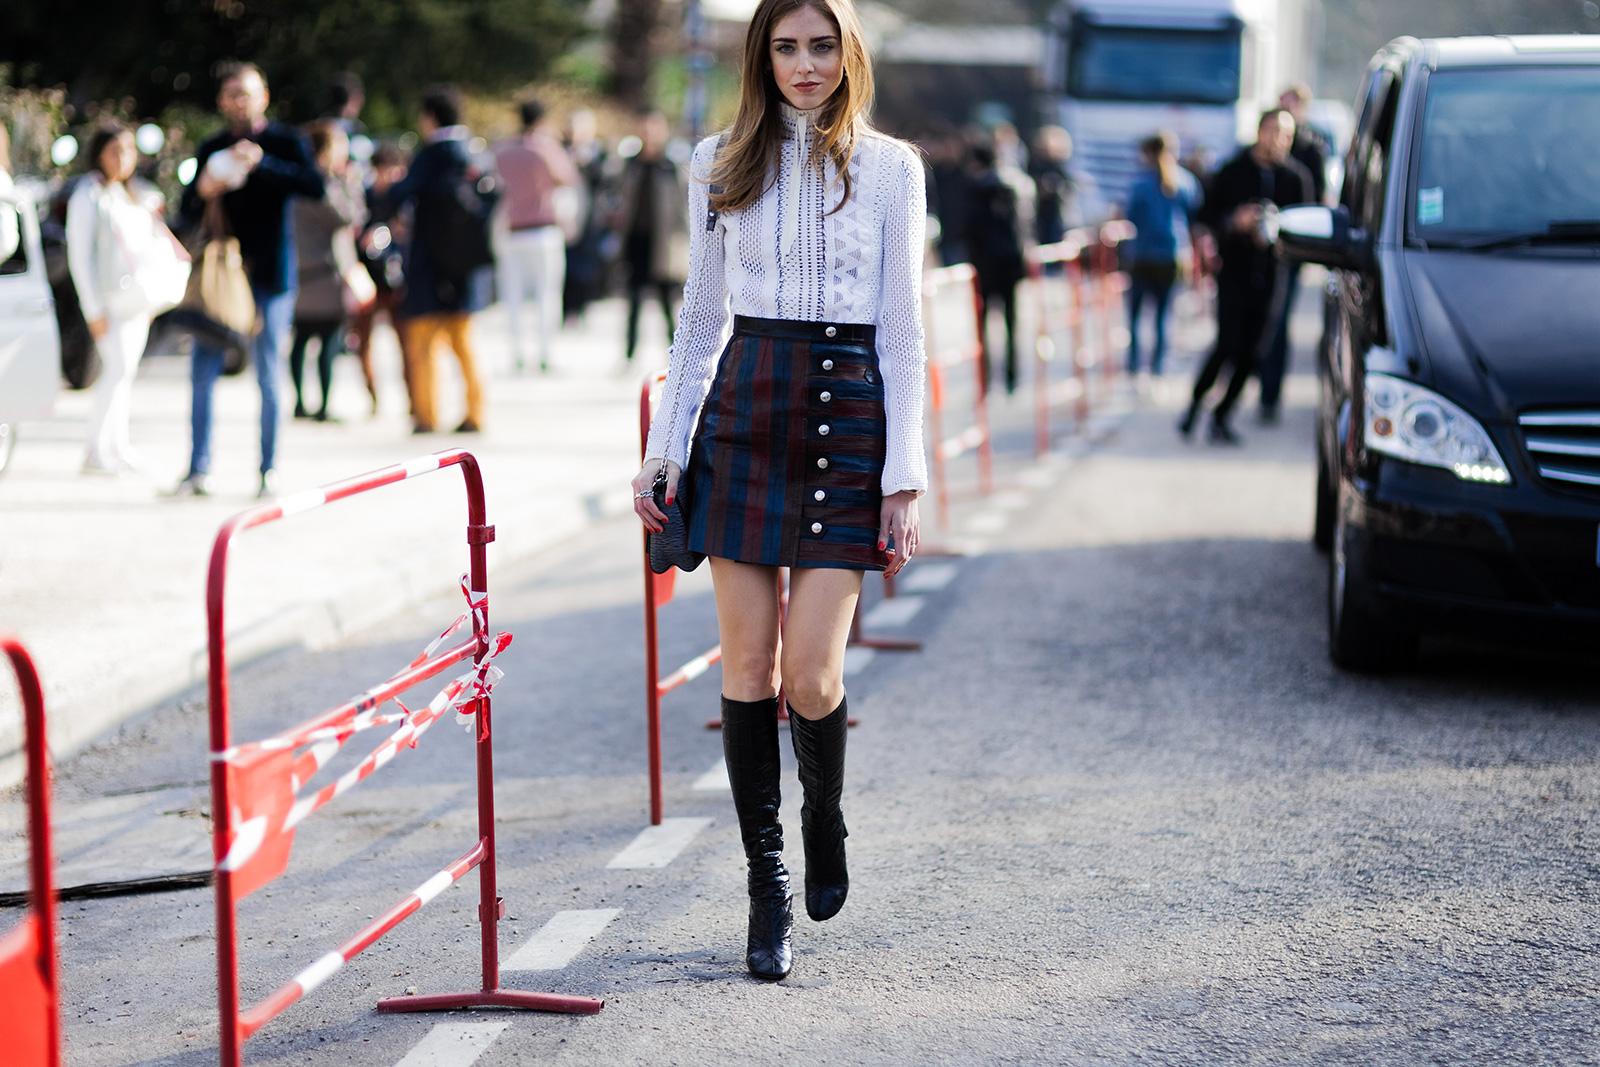 ShotByGio-George-Angelis-Chiara-Ferragni-Paris-Fashion-Week-Fall-Winter-2015-2016-Street-Style-5048.jpg